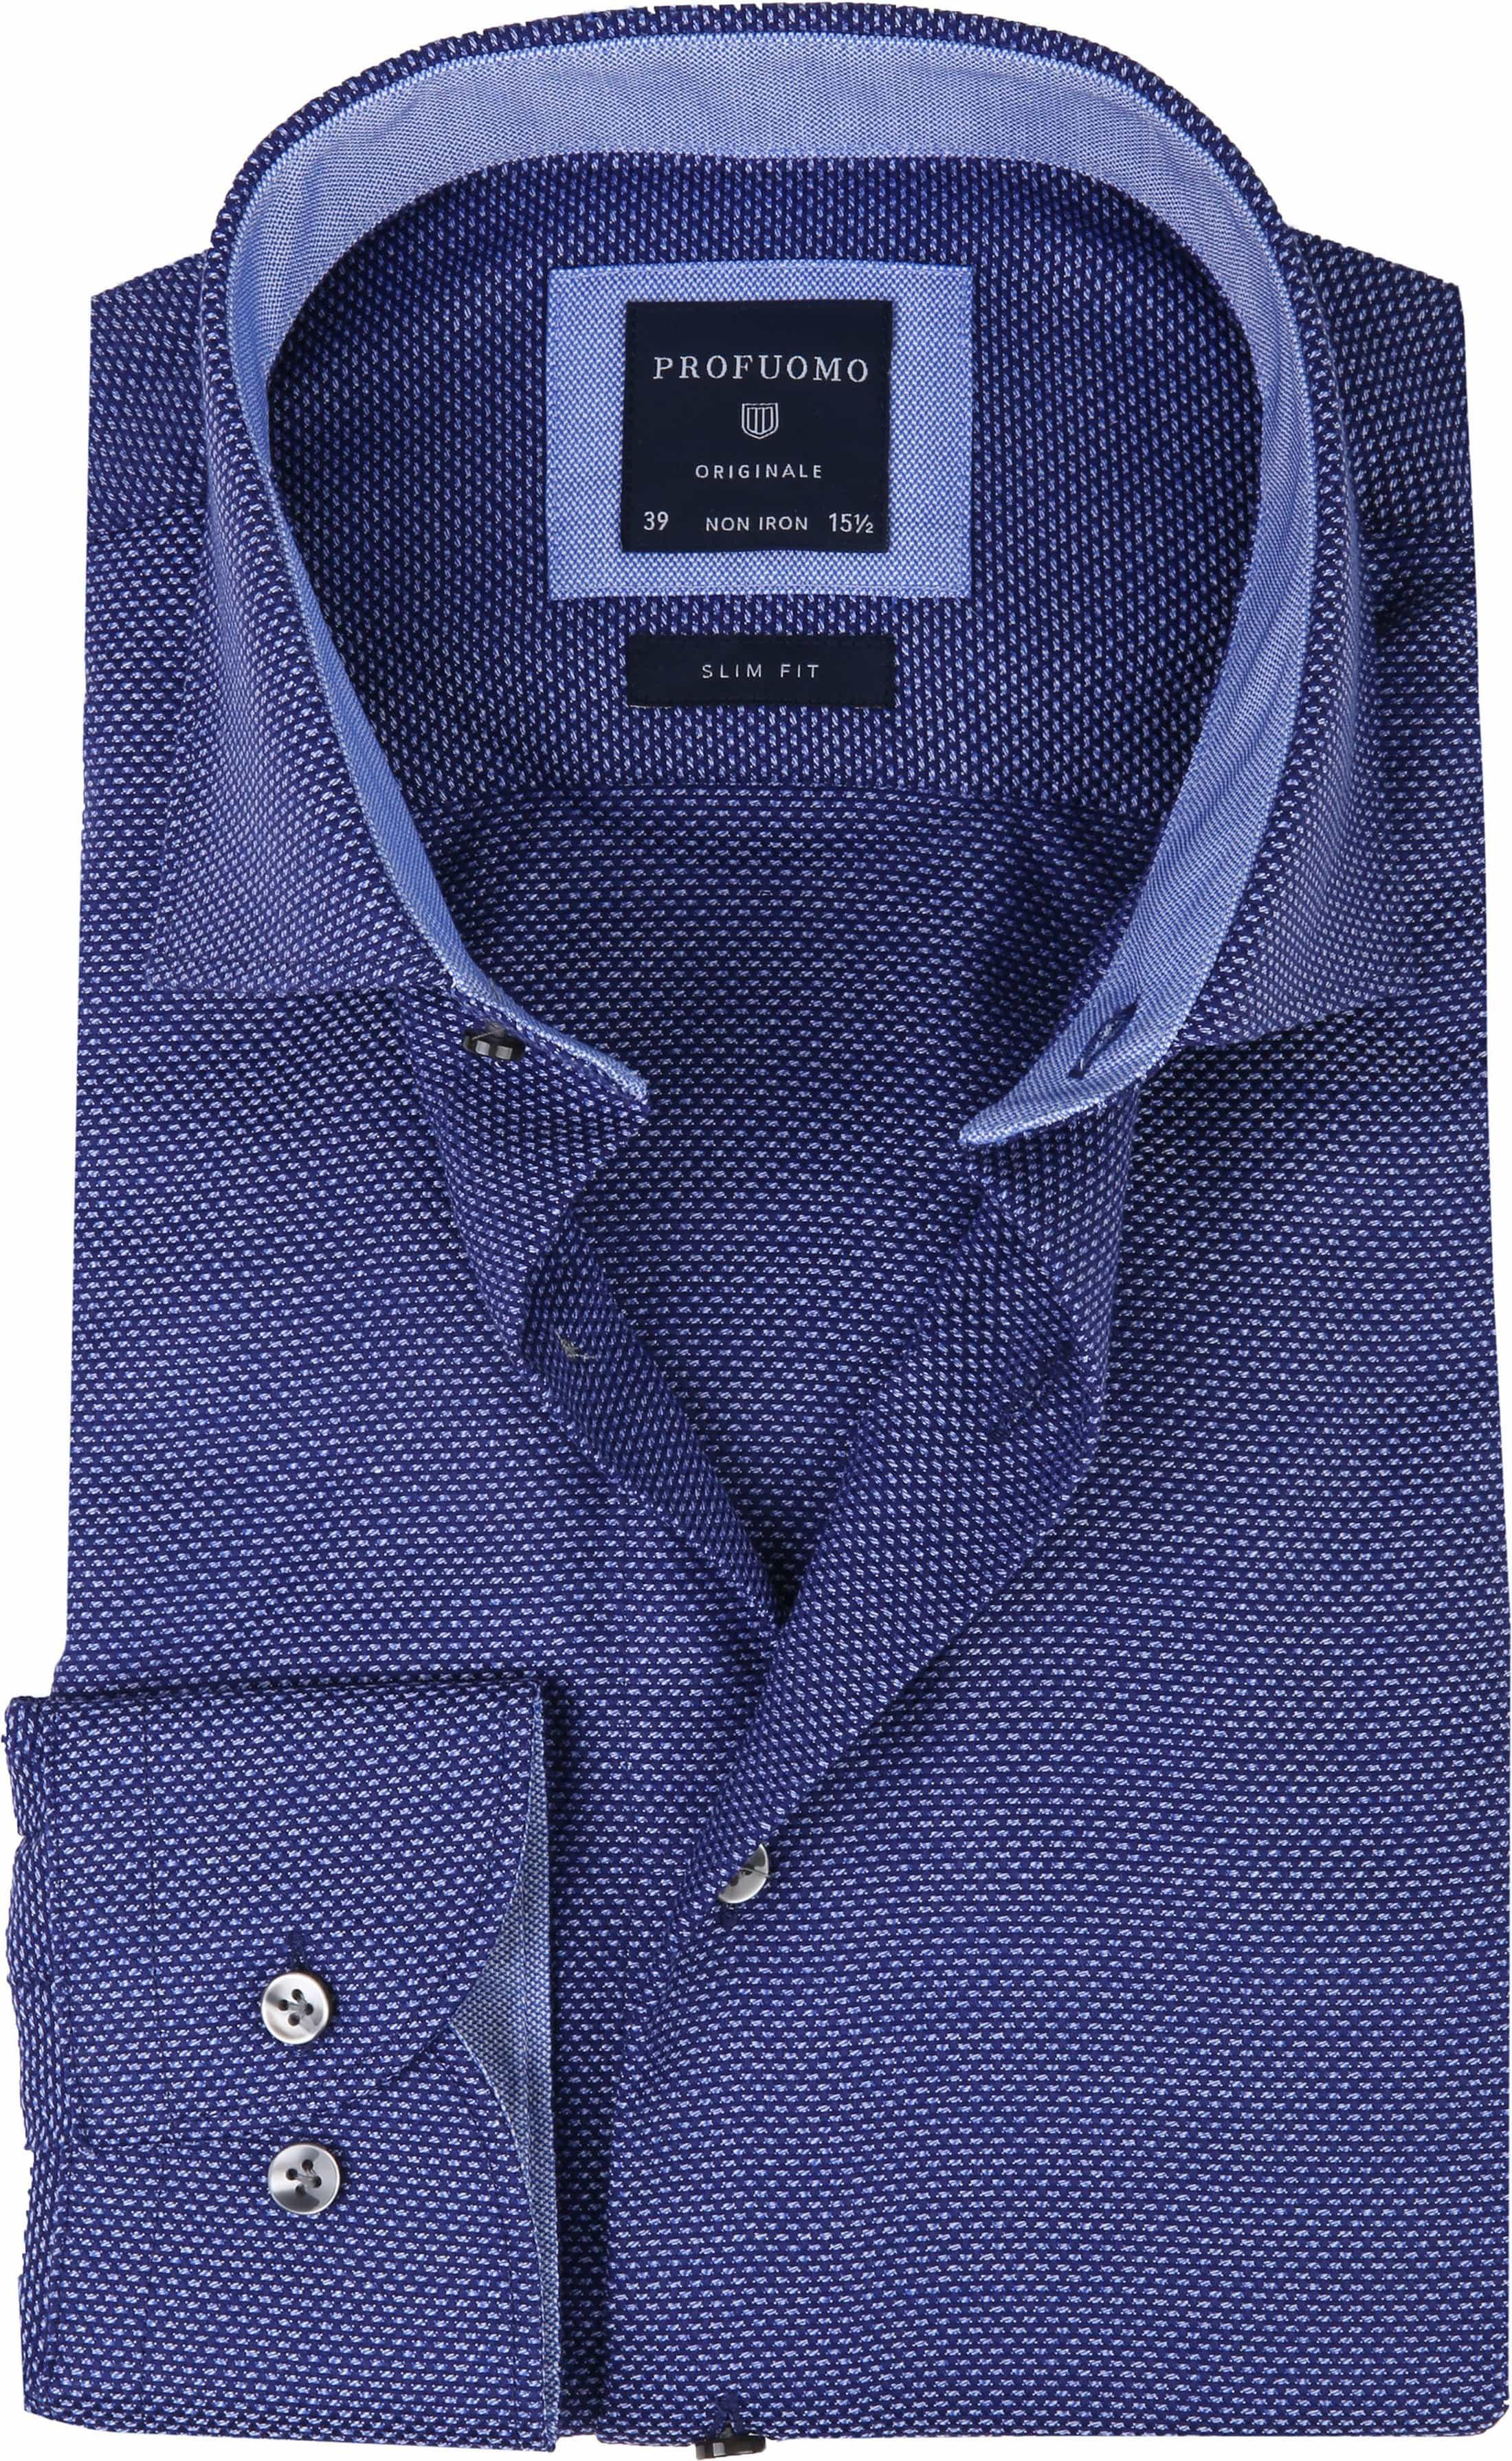 Profuomo Overhemd.Profuomo Overhemd Oxford Navy Dessin Ppph3a1023 Online Bestellen